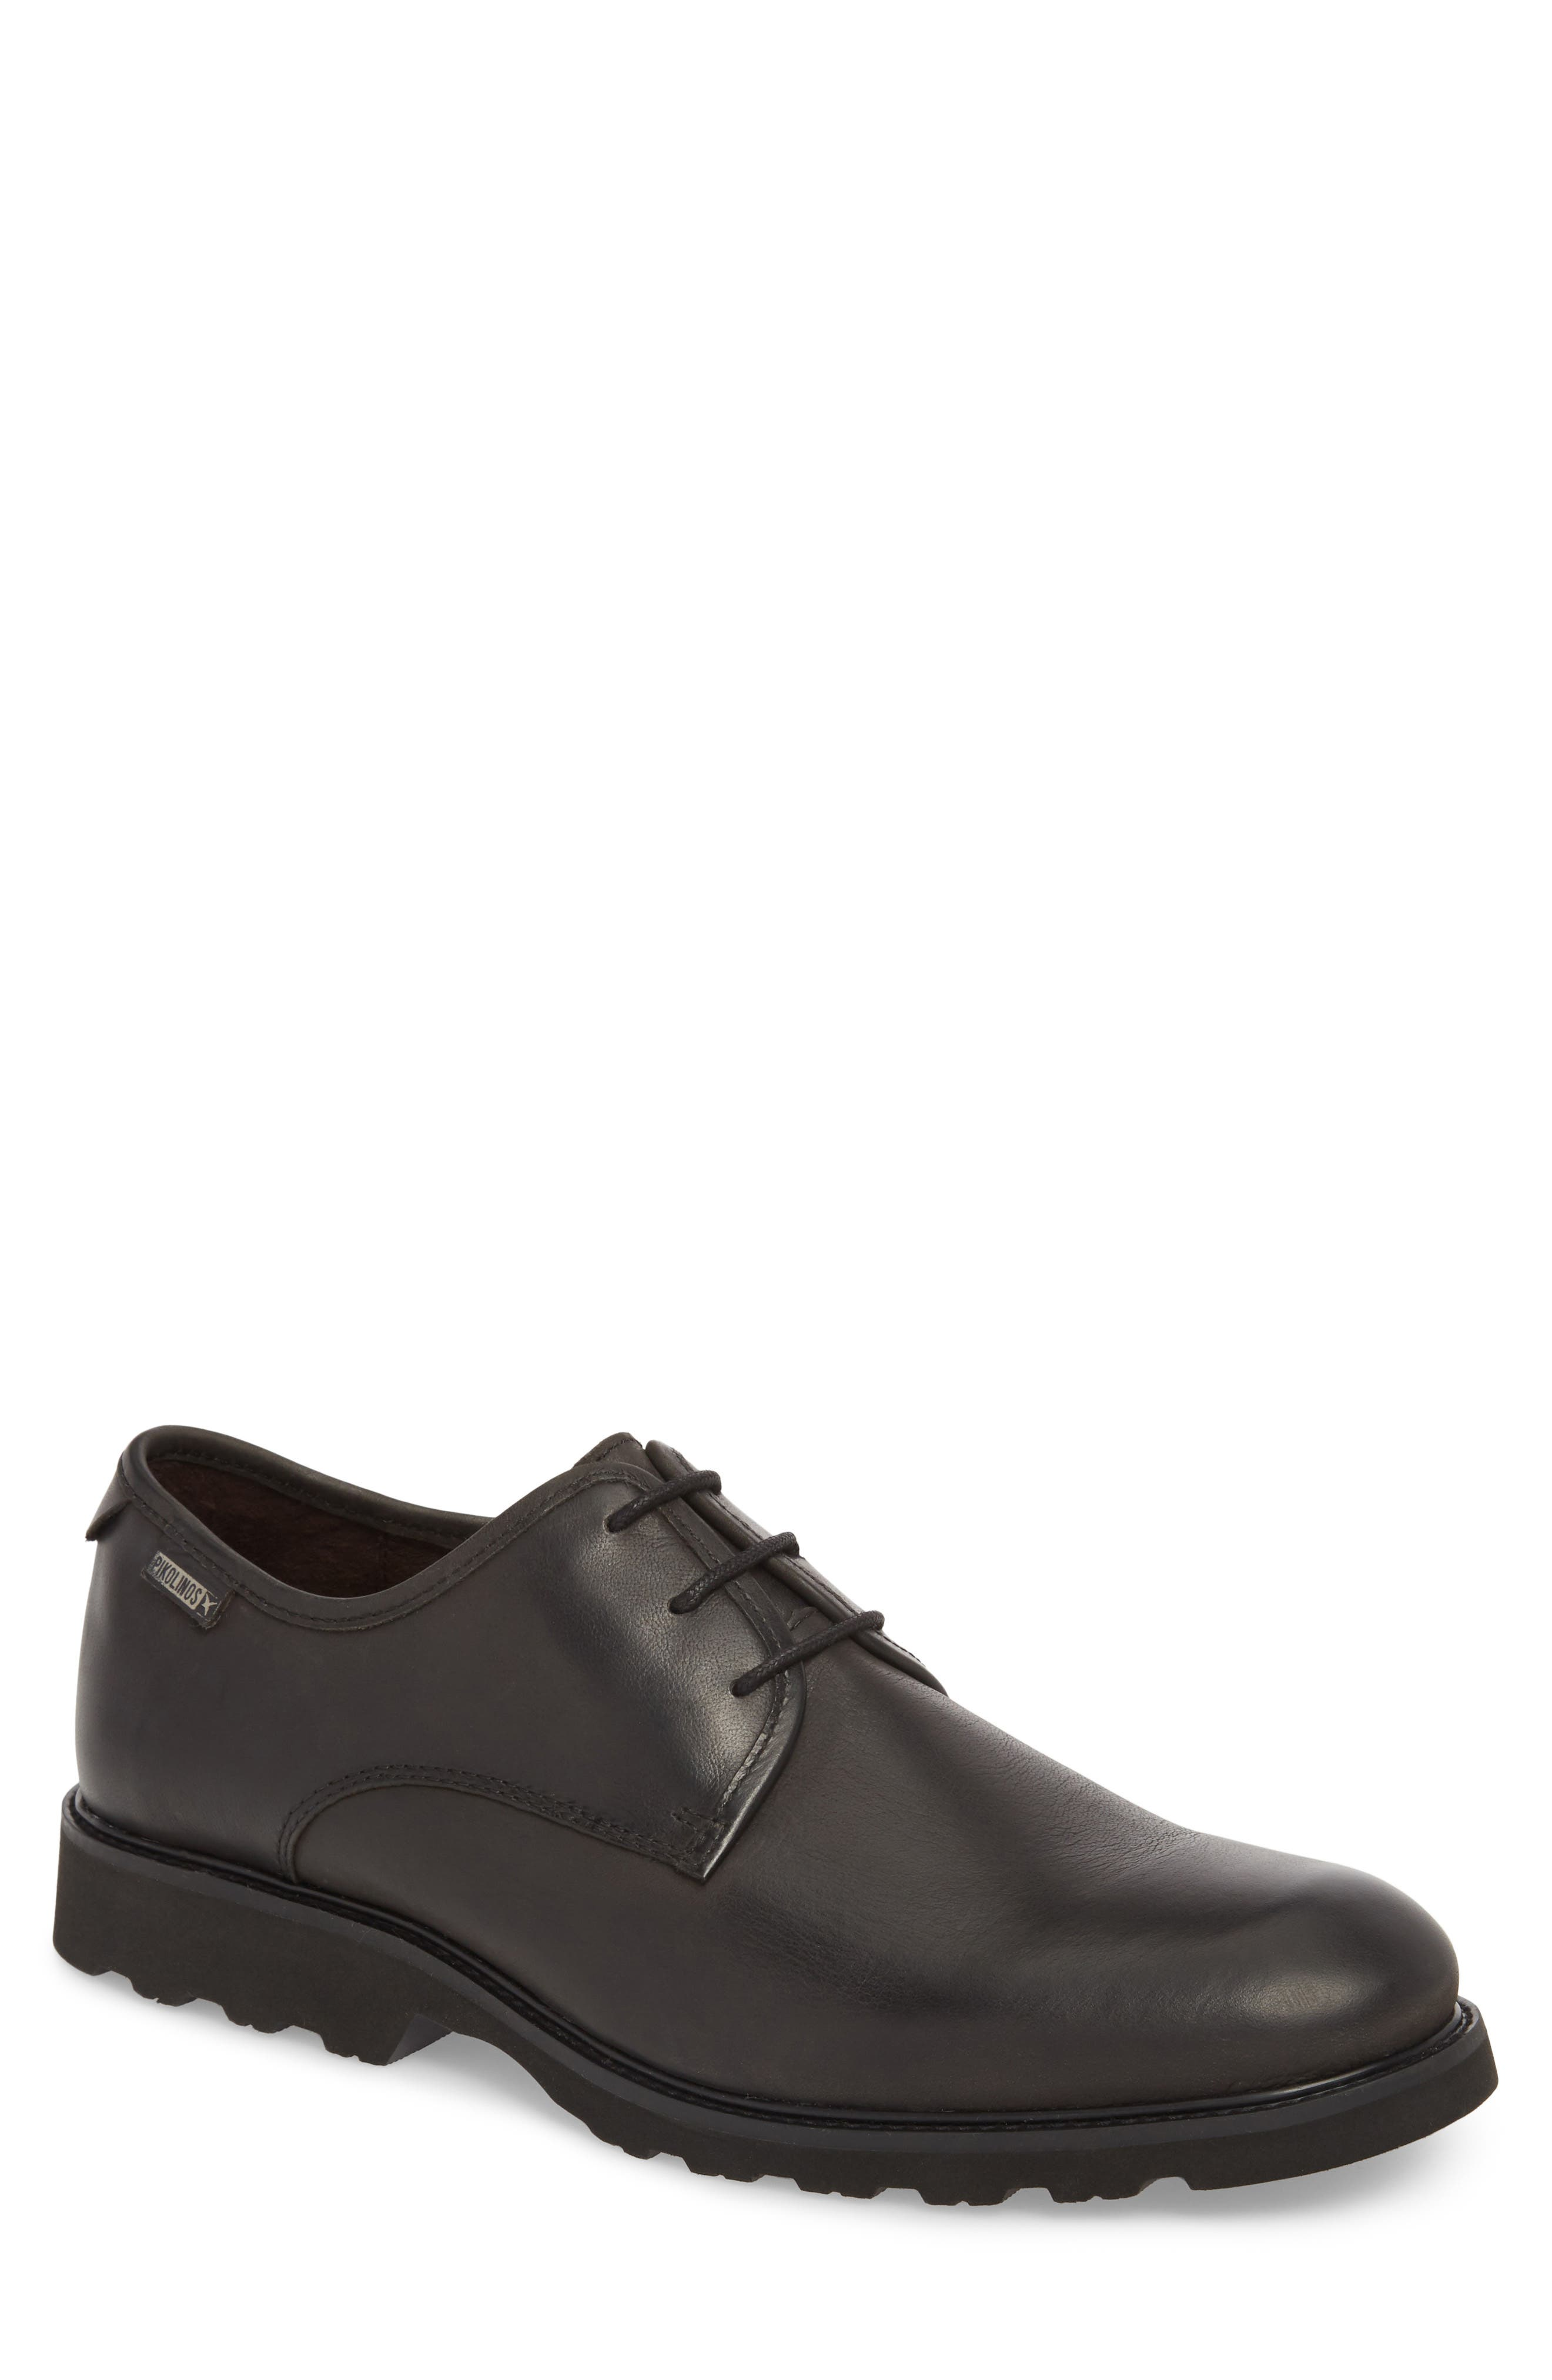 'Glasgow' Derby,                         Main,                         color, Black Leather